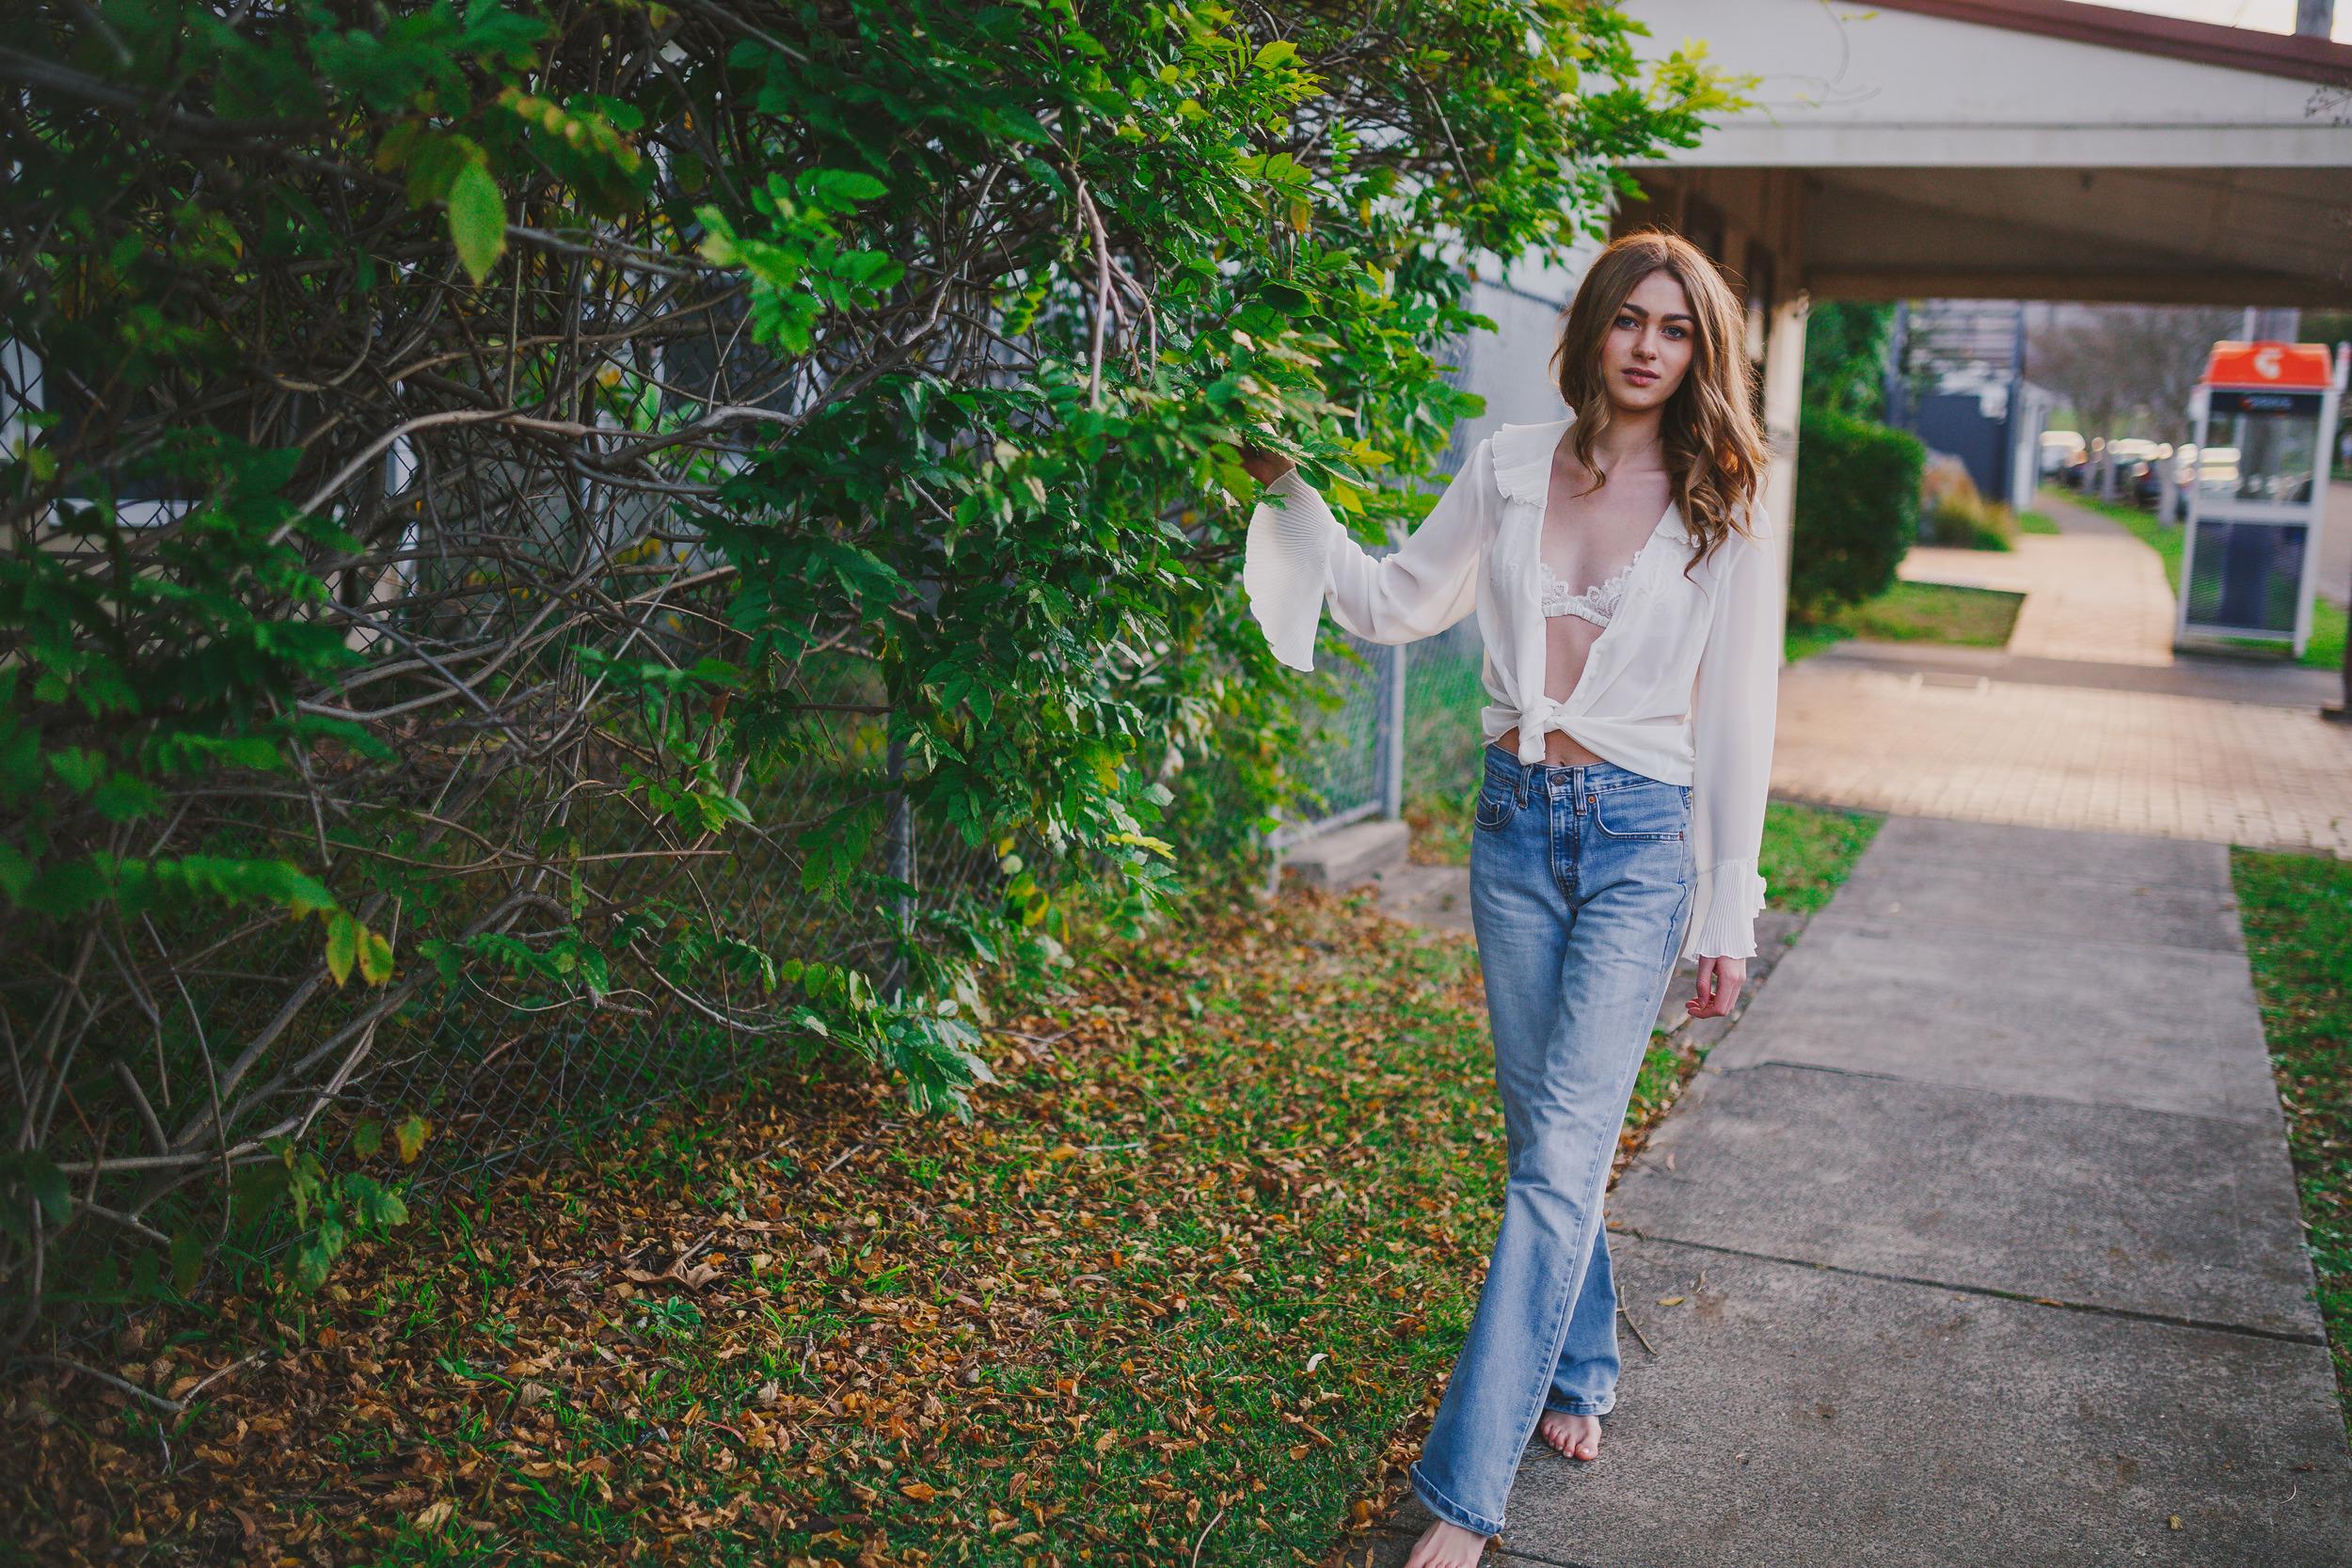 Brooke_Alana Taylor Photography-66.jpg